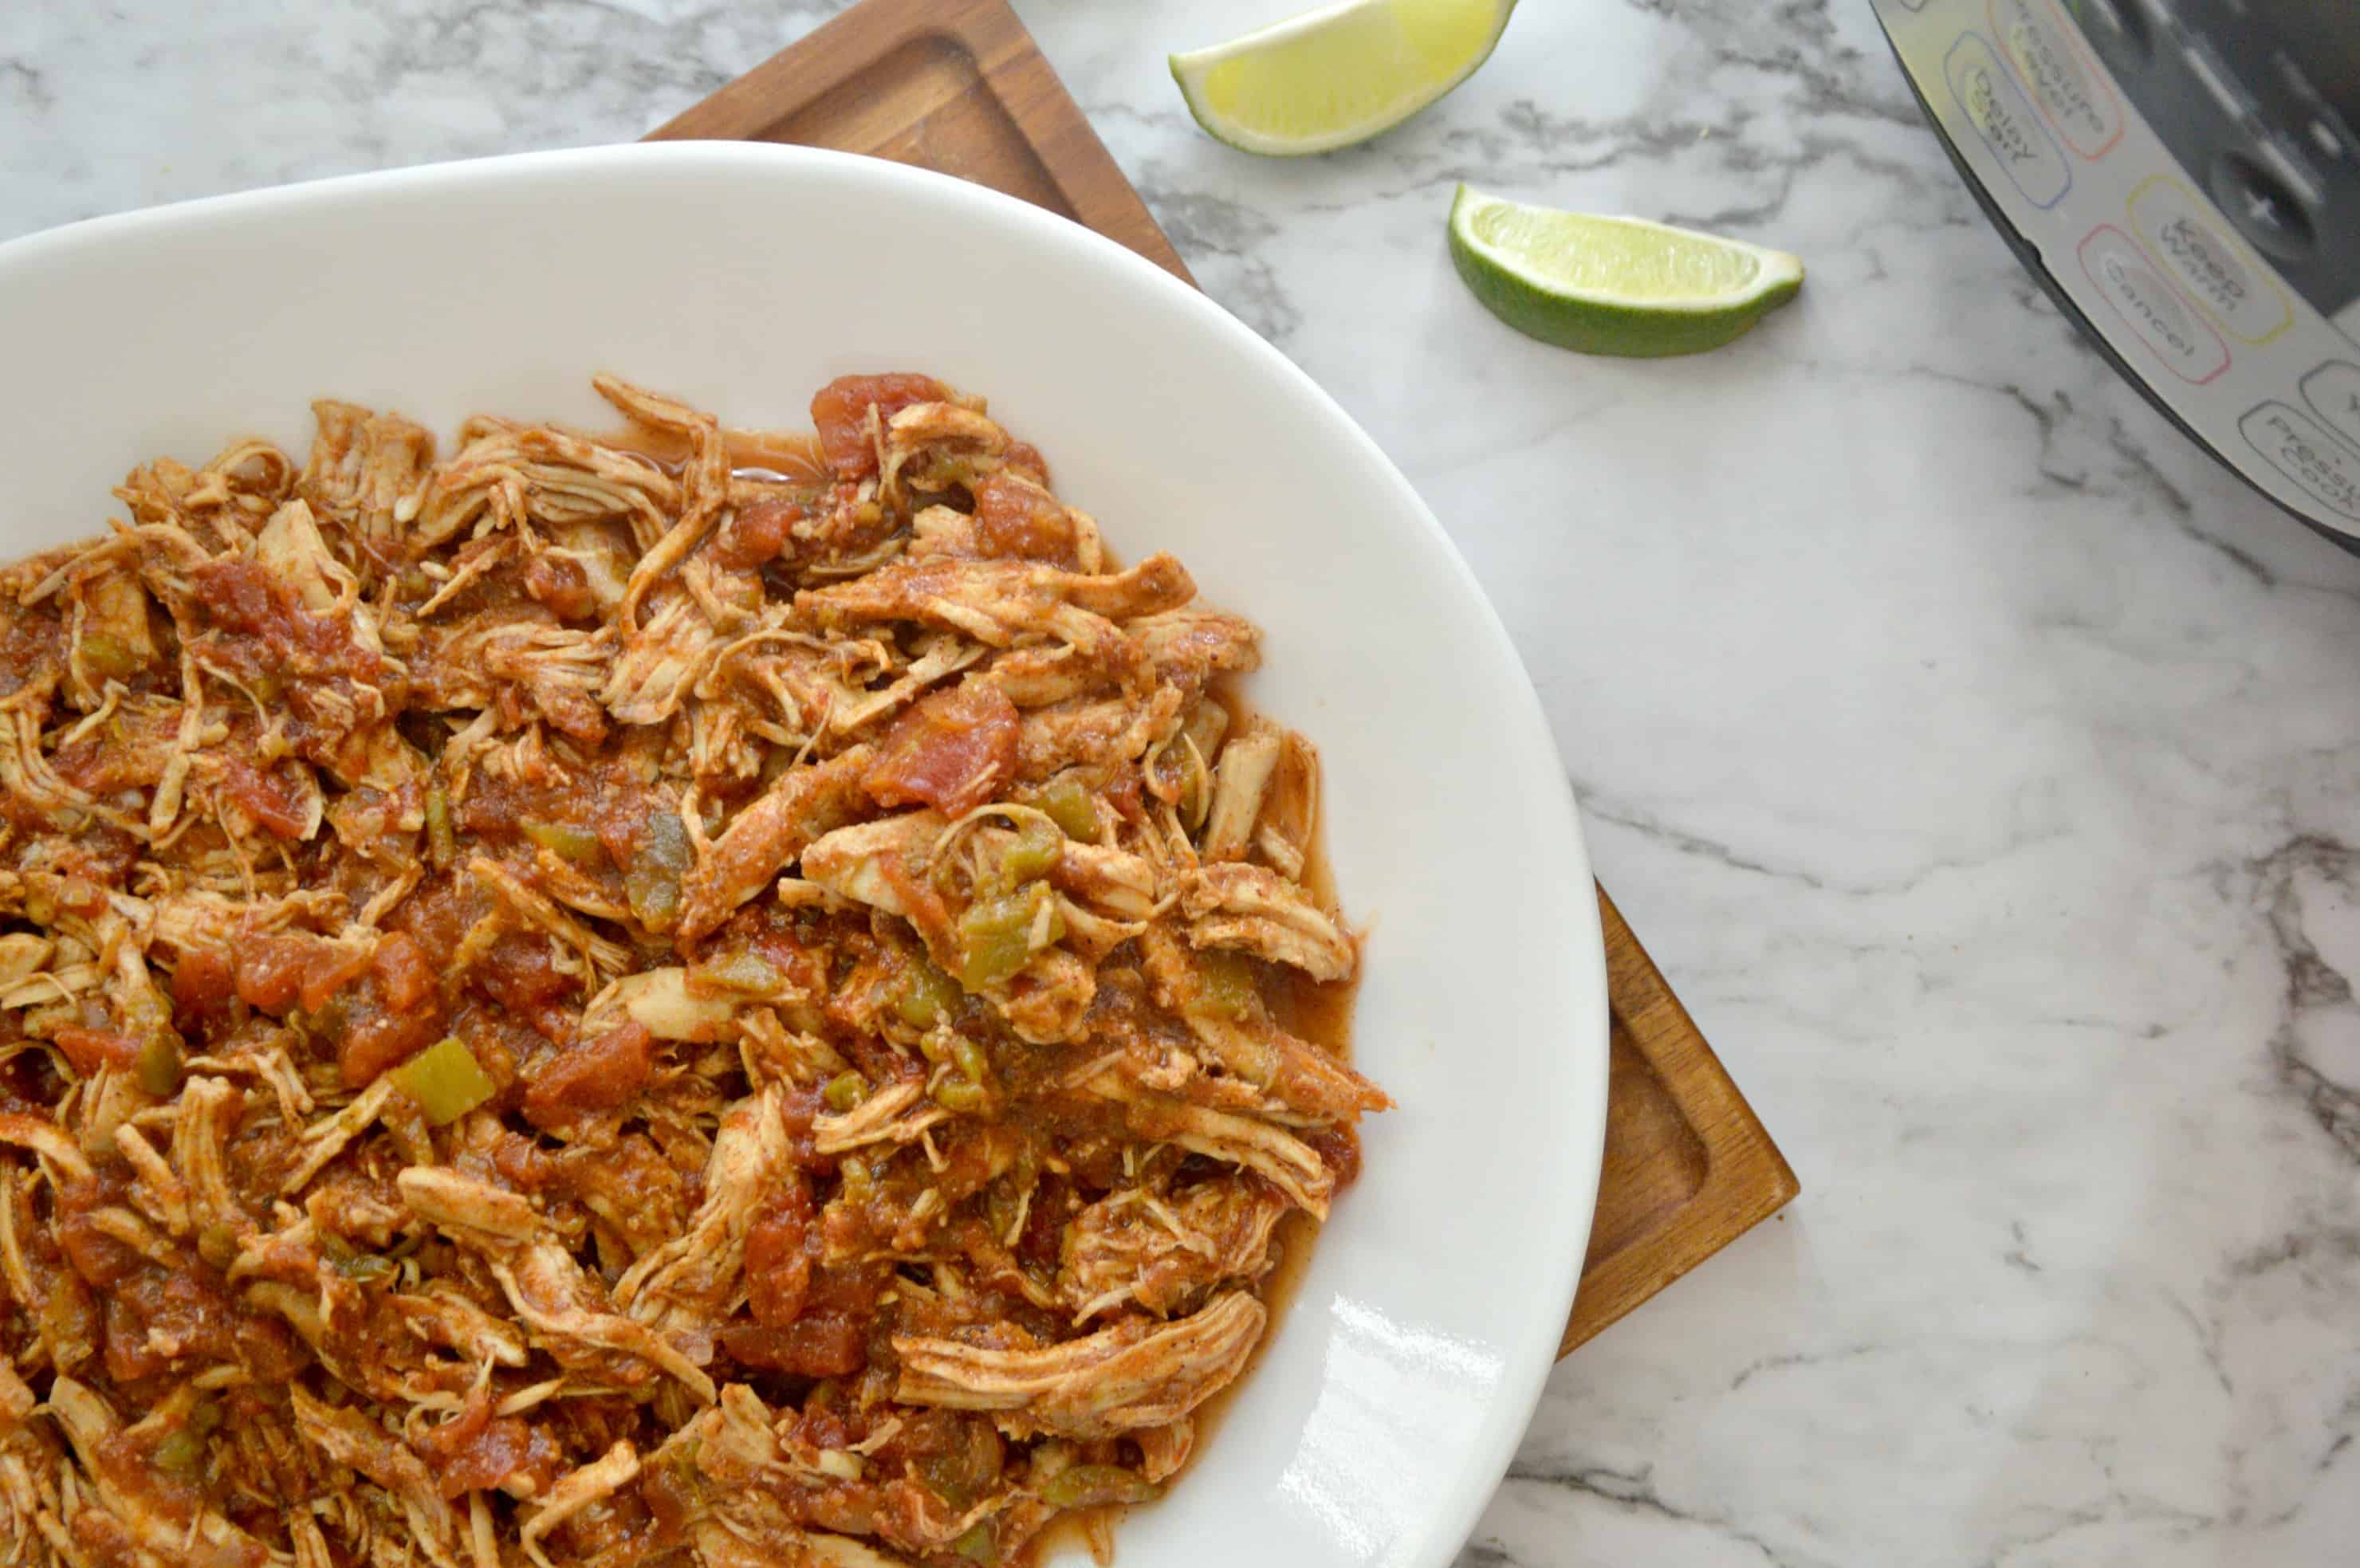 Easy Instant Pot Shredded Mexican Chicken